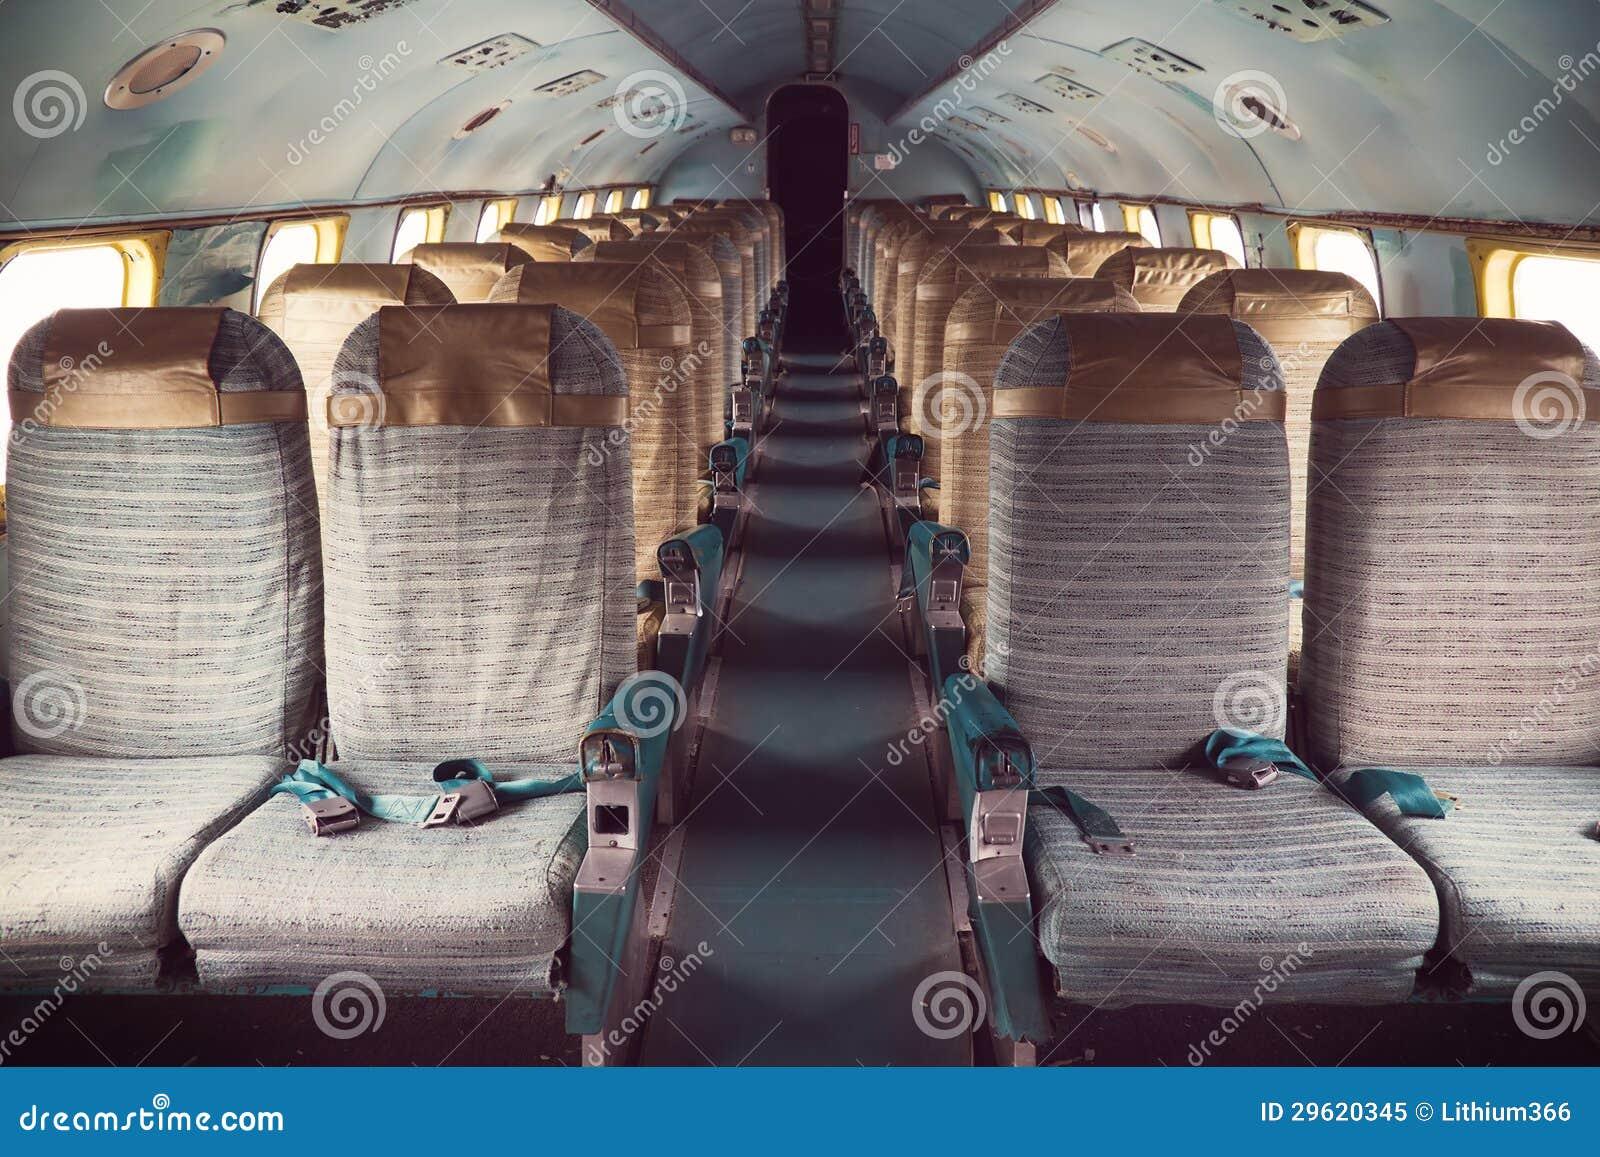 Preview for Interieur avion easyjet